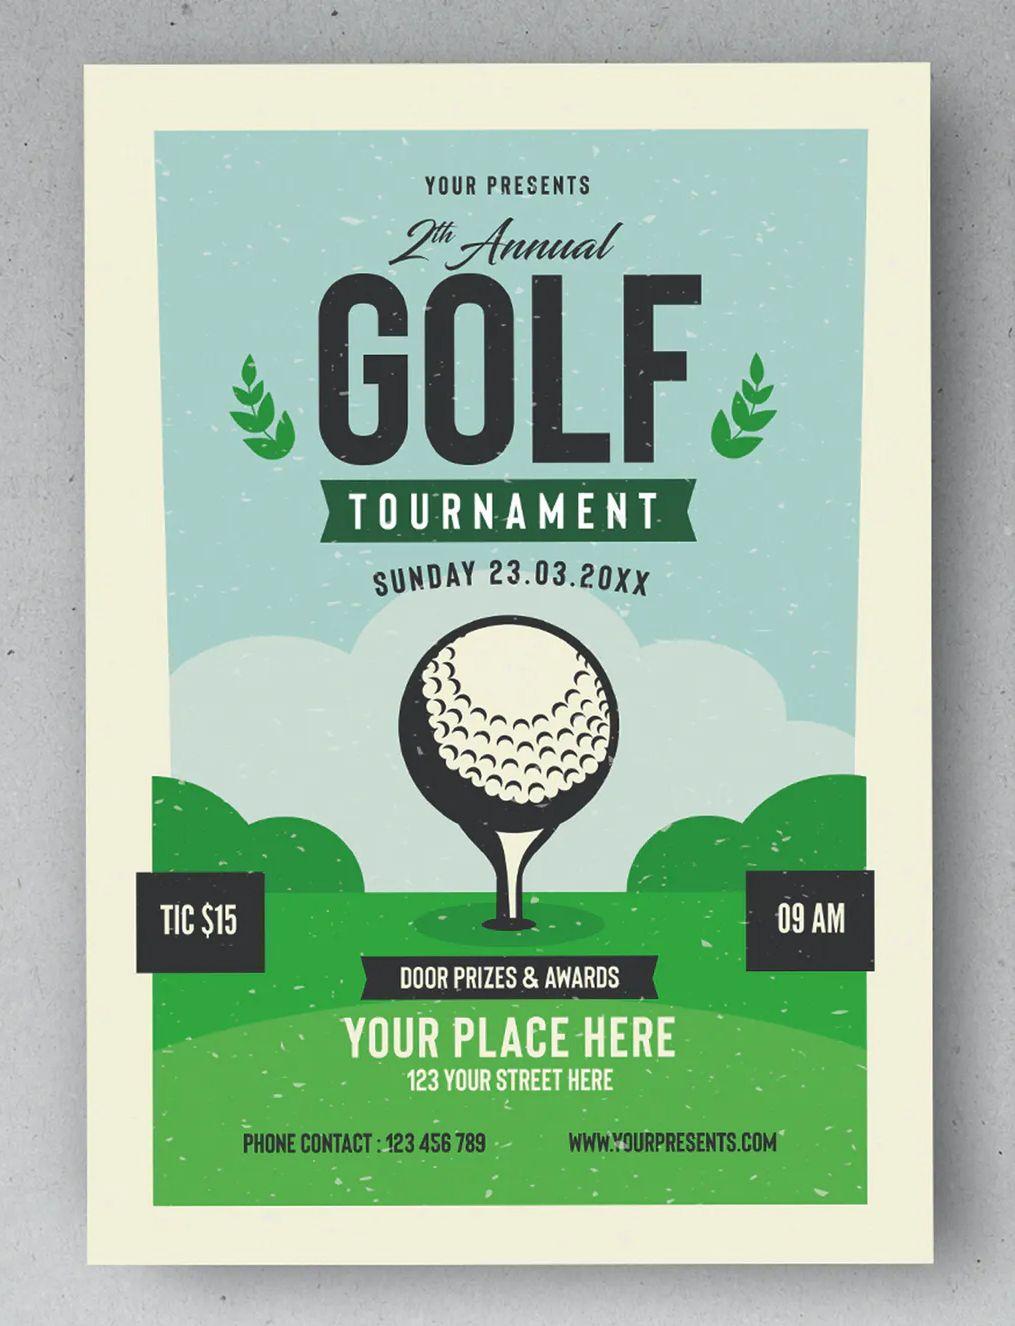 Golf Tournament Flyer Template Golf Tournament Flyer Tournaments Golf tournament flyer template publisher